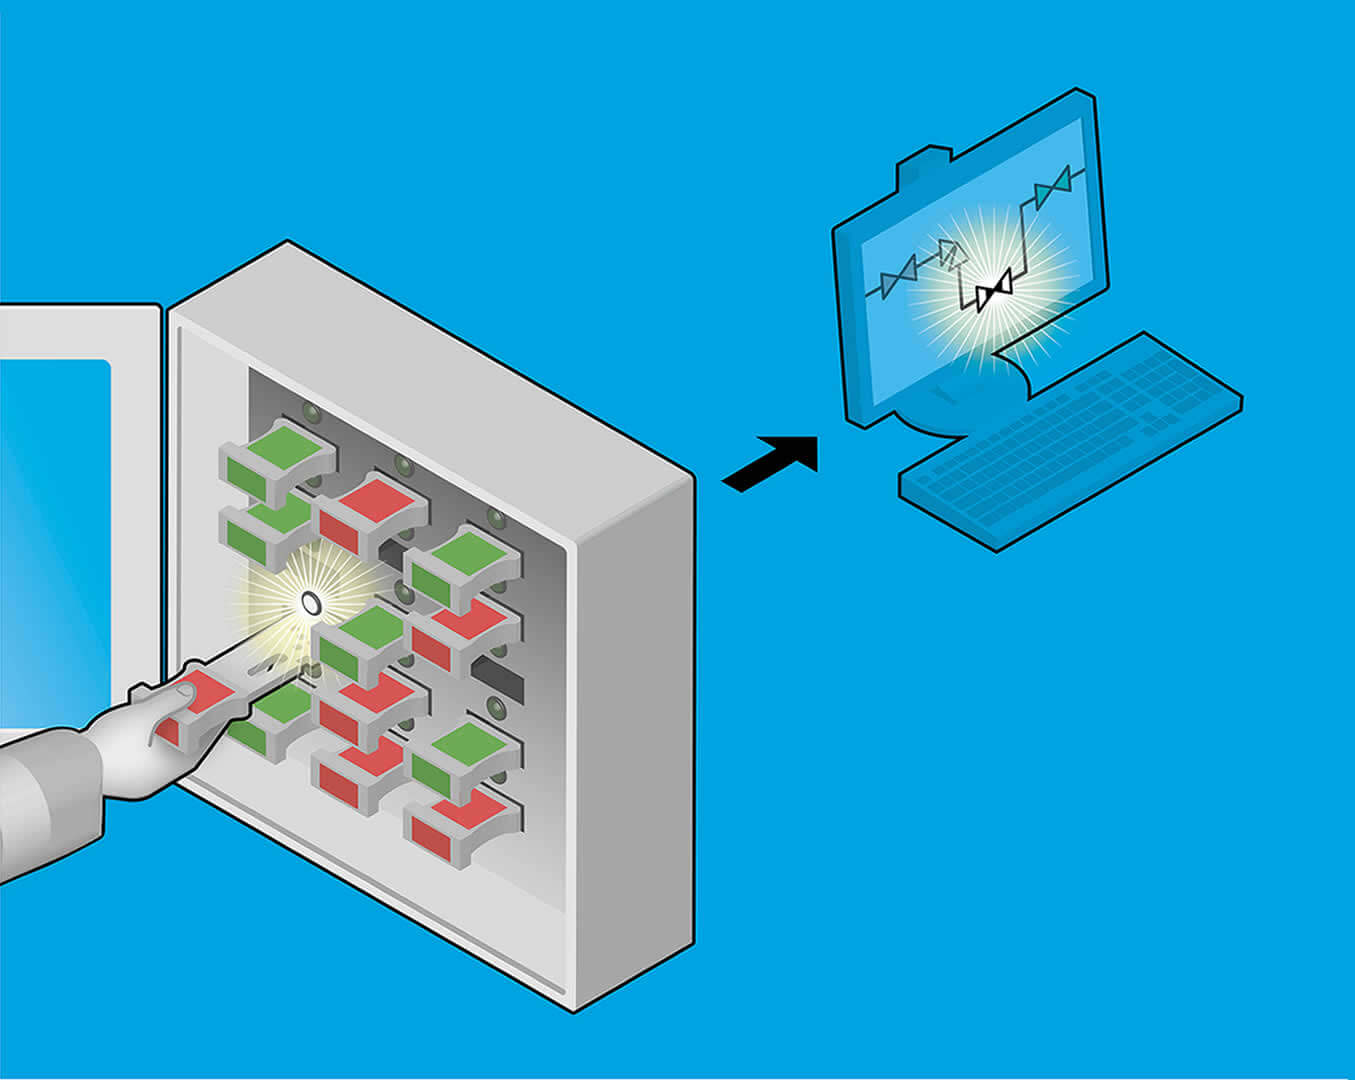 Key detect system for valve interlocks